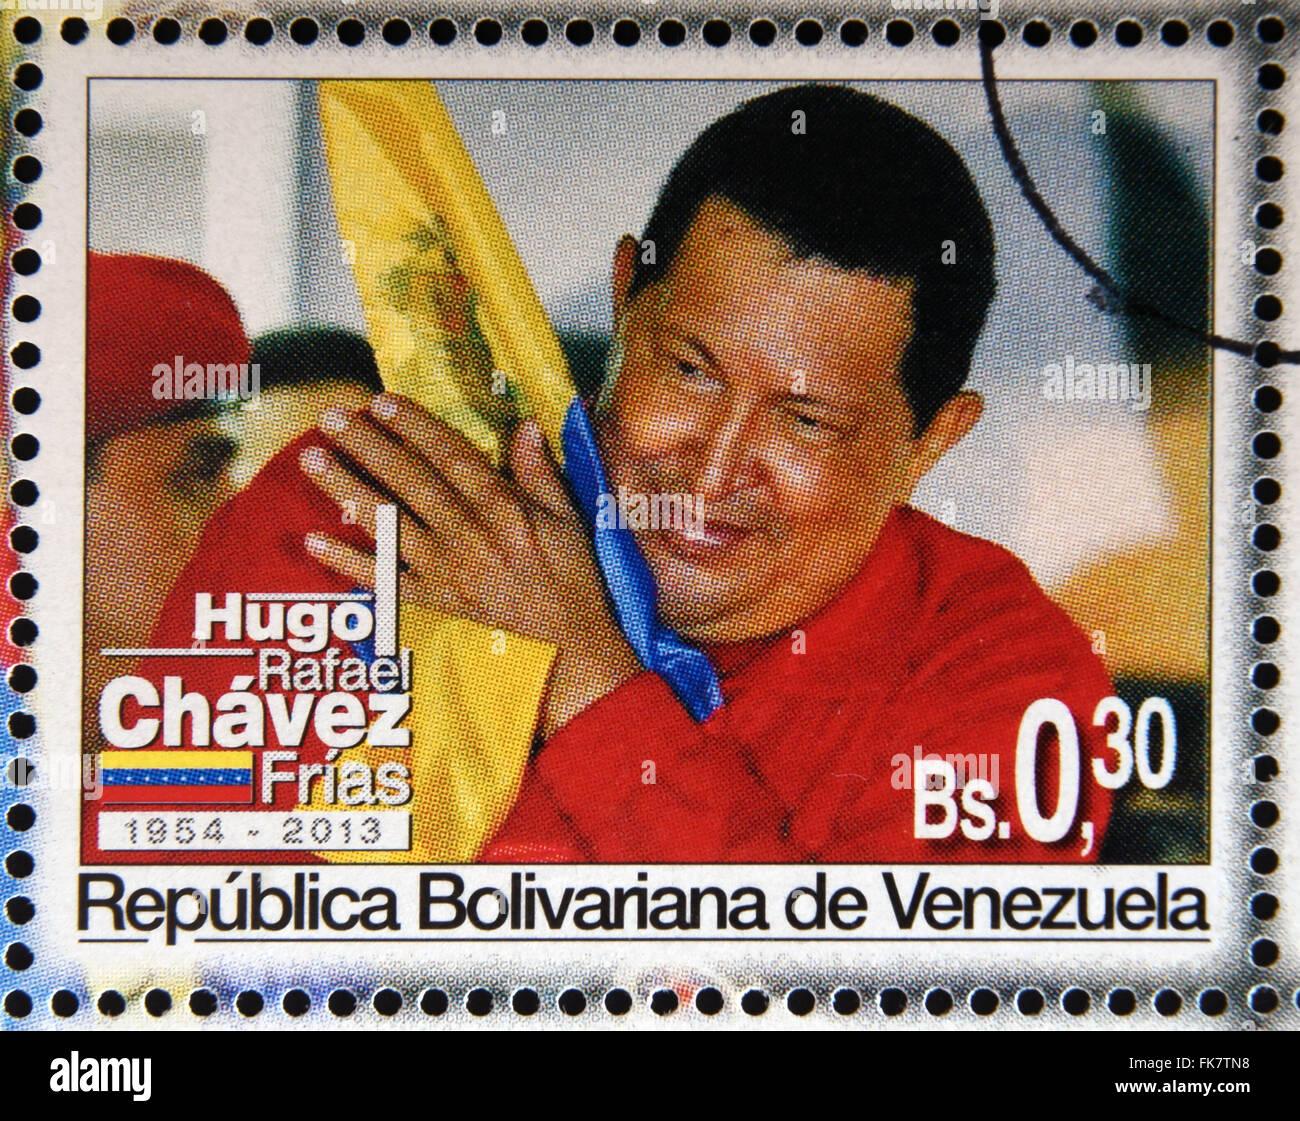 BOLIVARIAN REPUBLIC OF VENEZUELA - CIRCA 2013: A stamp printed in Venezuela shows Hugo Rafael Chavez (1954-2013), - Stock Image